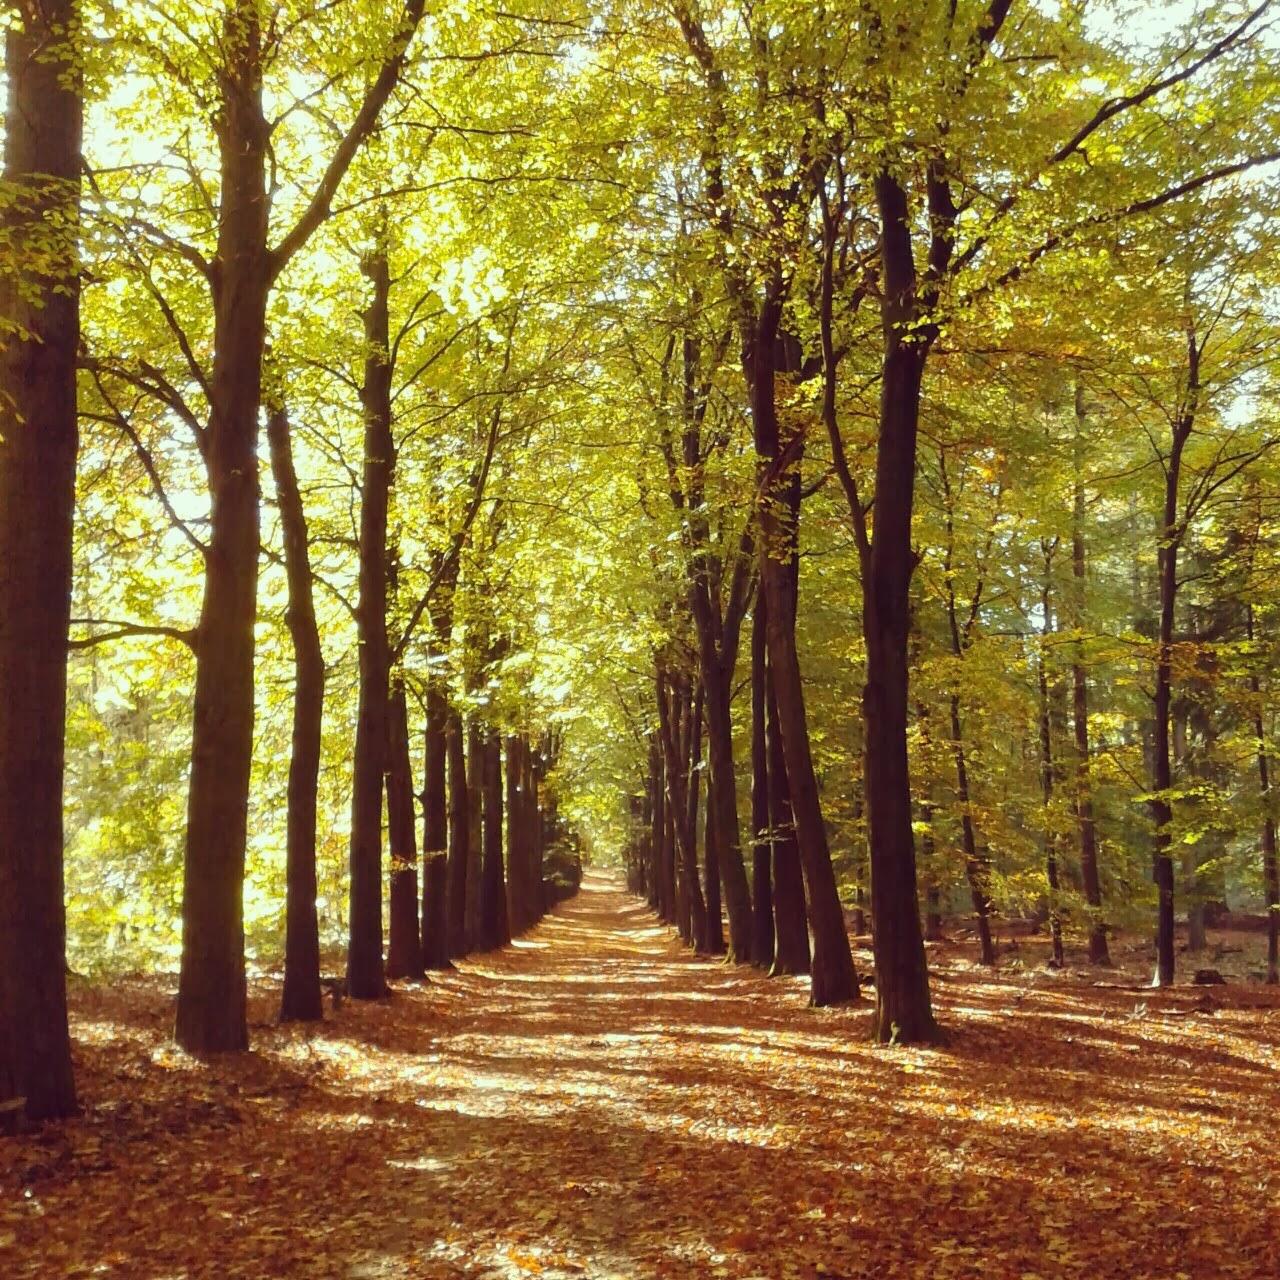 Girl Meets World: Fall Inspiration